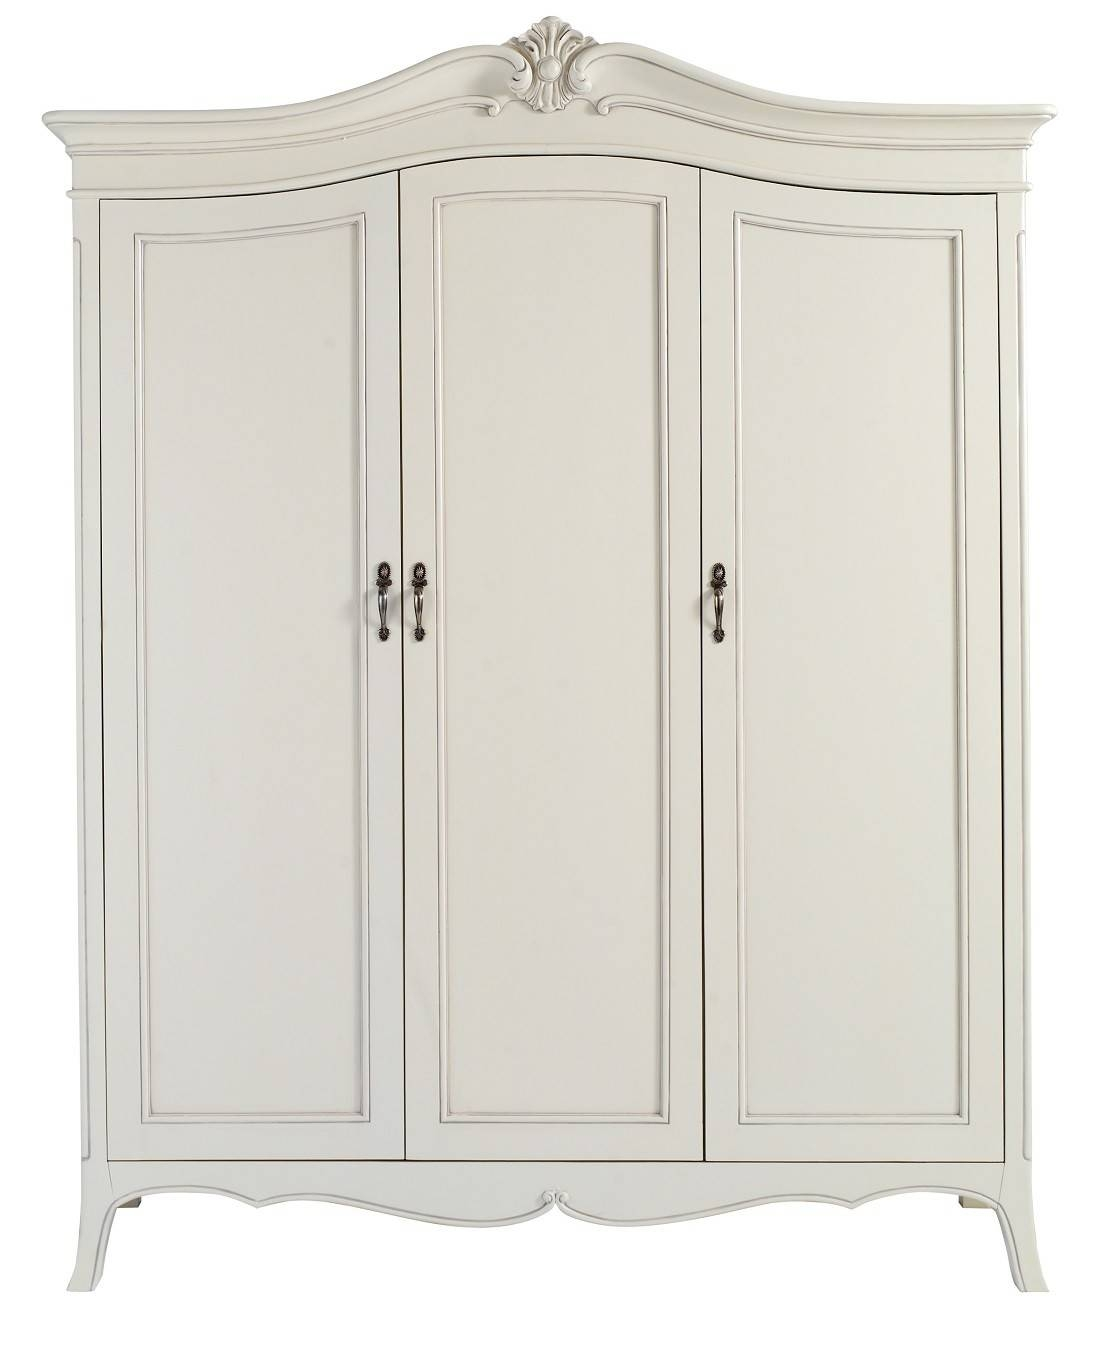 Louis French Ivory Painted 3 Door Triple Wardrobe | Oak Furniture Uk regarding Painted Triple Wardrobes (Image 10 of 15)